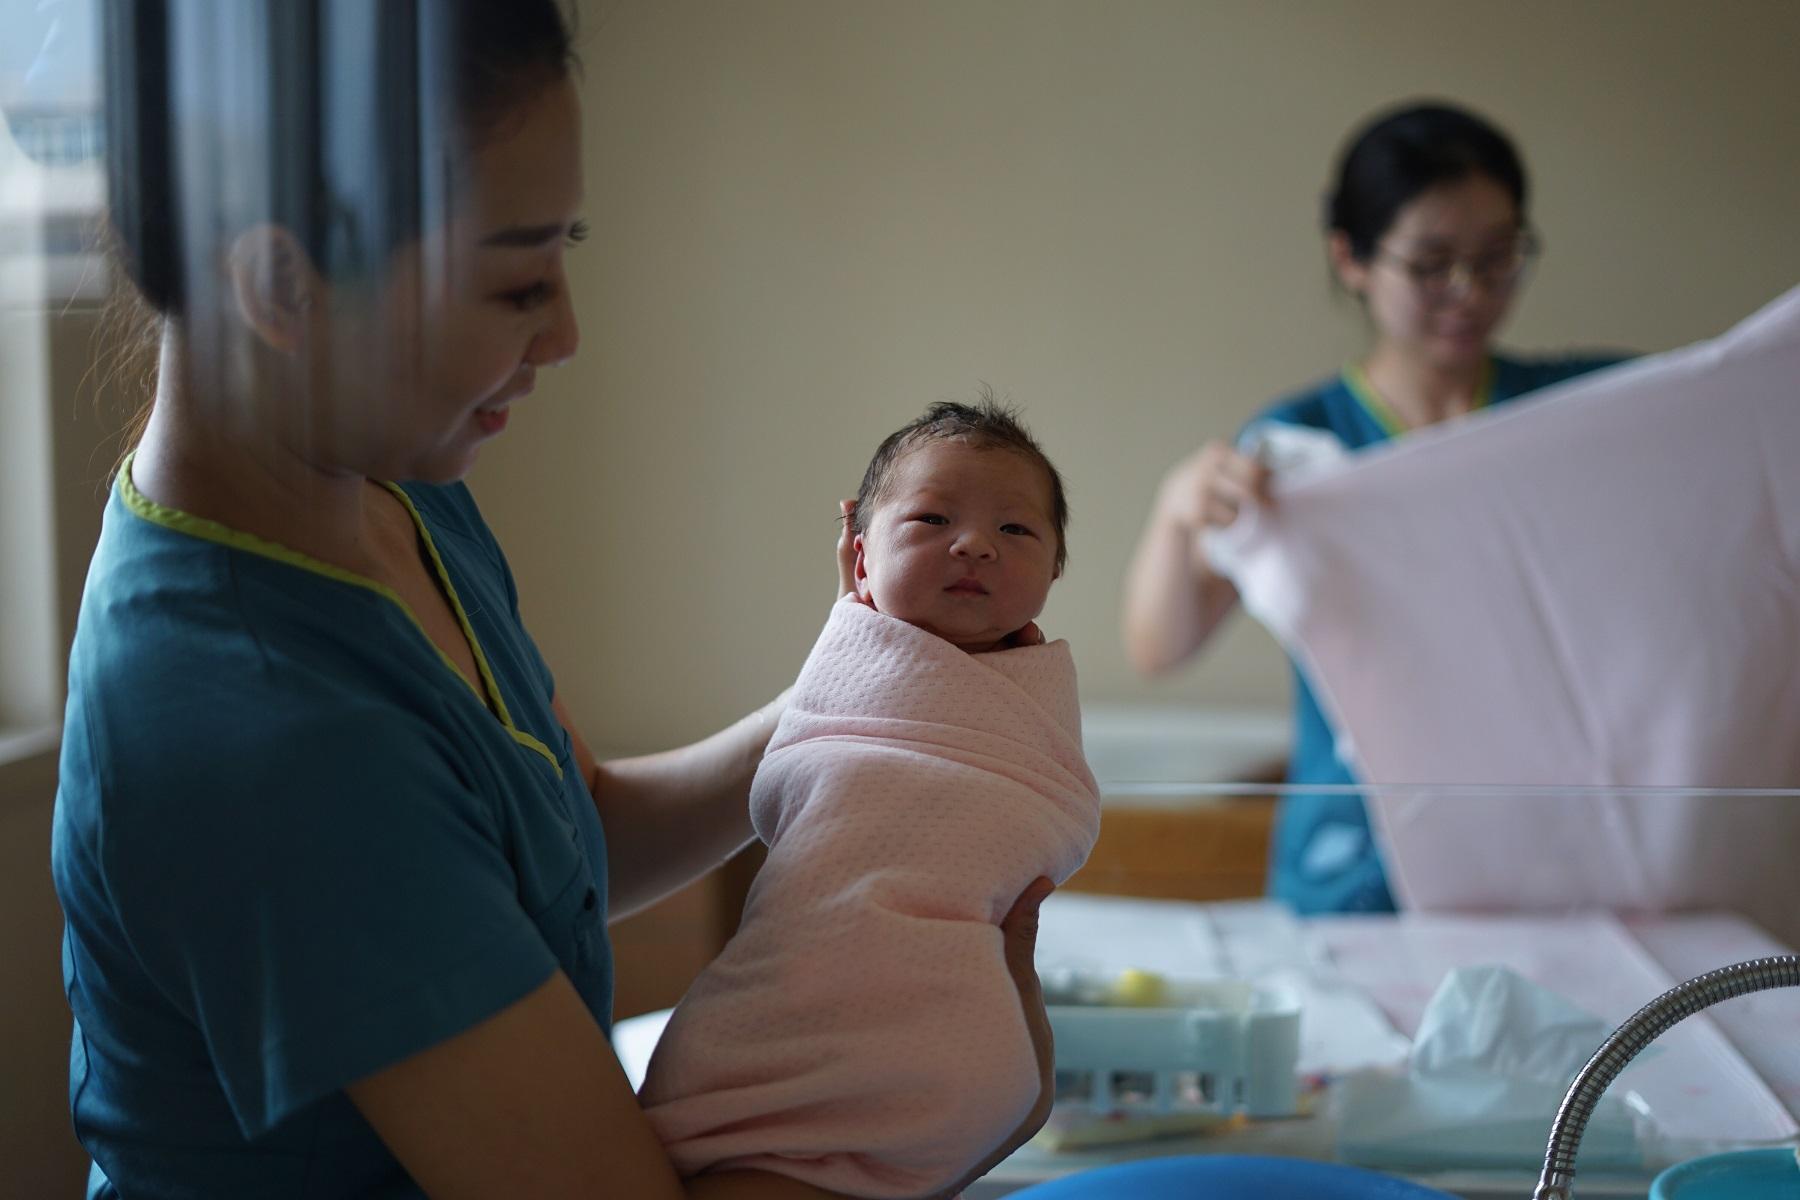 nurses share about their COVID-19 pregnancies